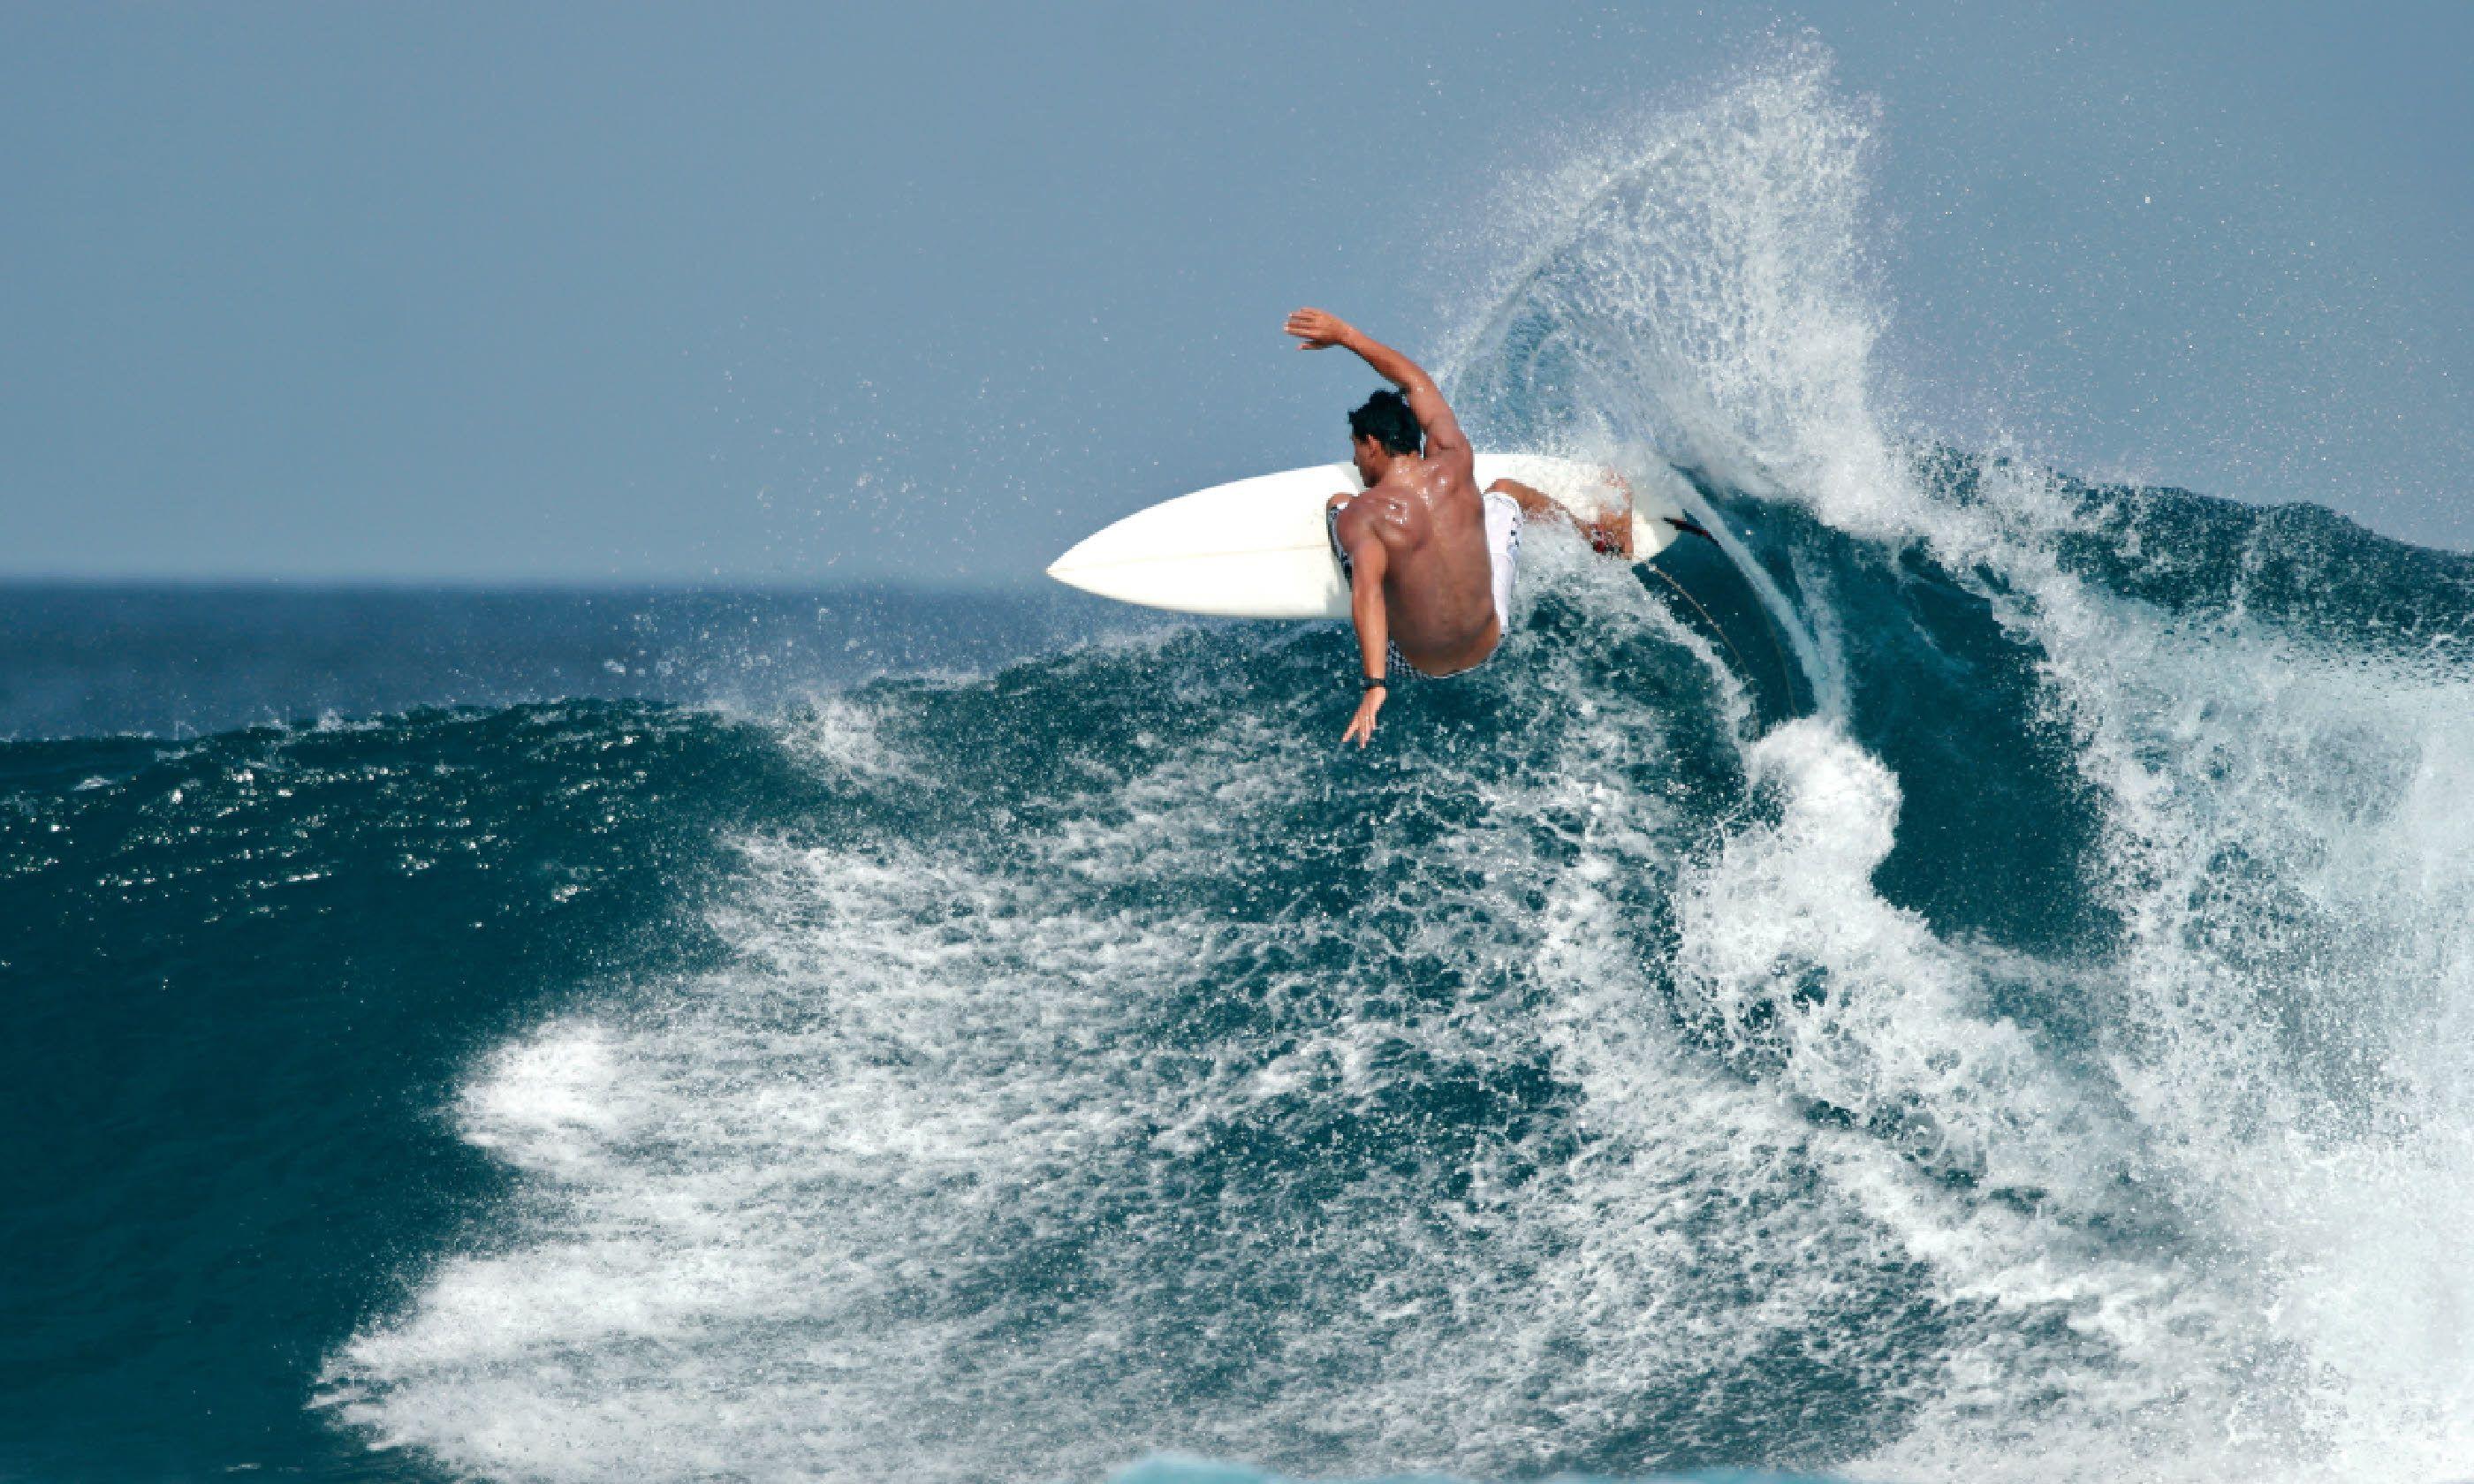 Surfer, Maldives (Shutterstock)